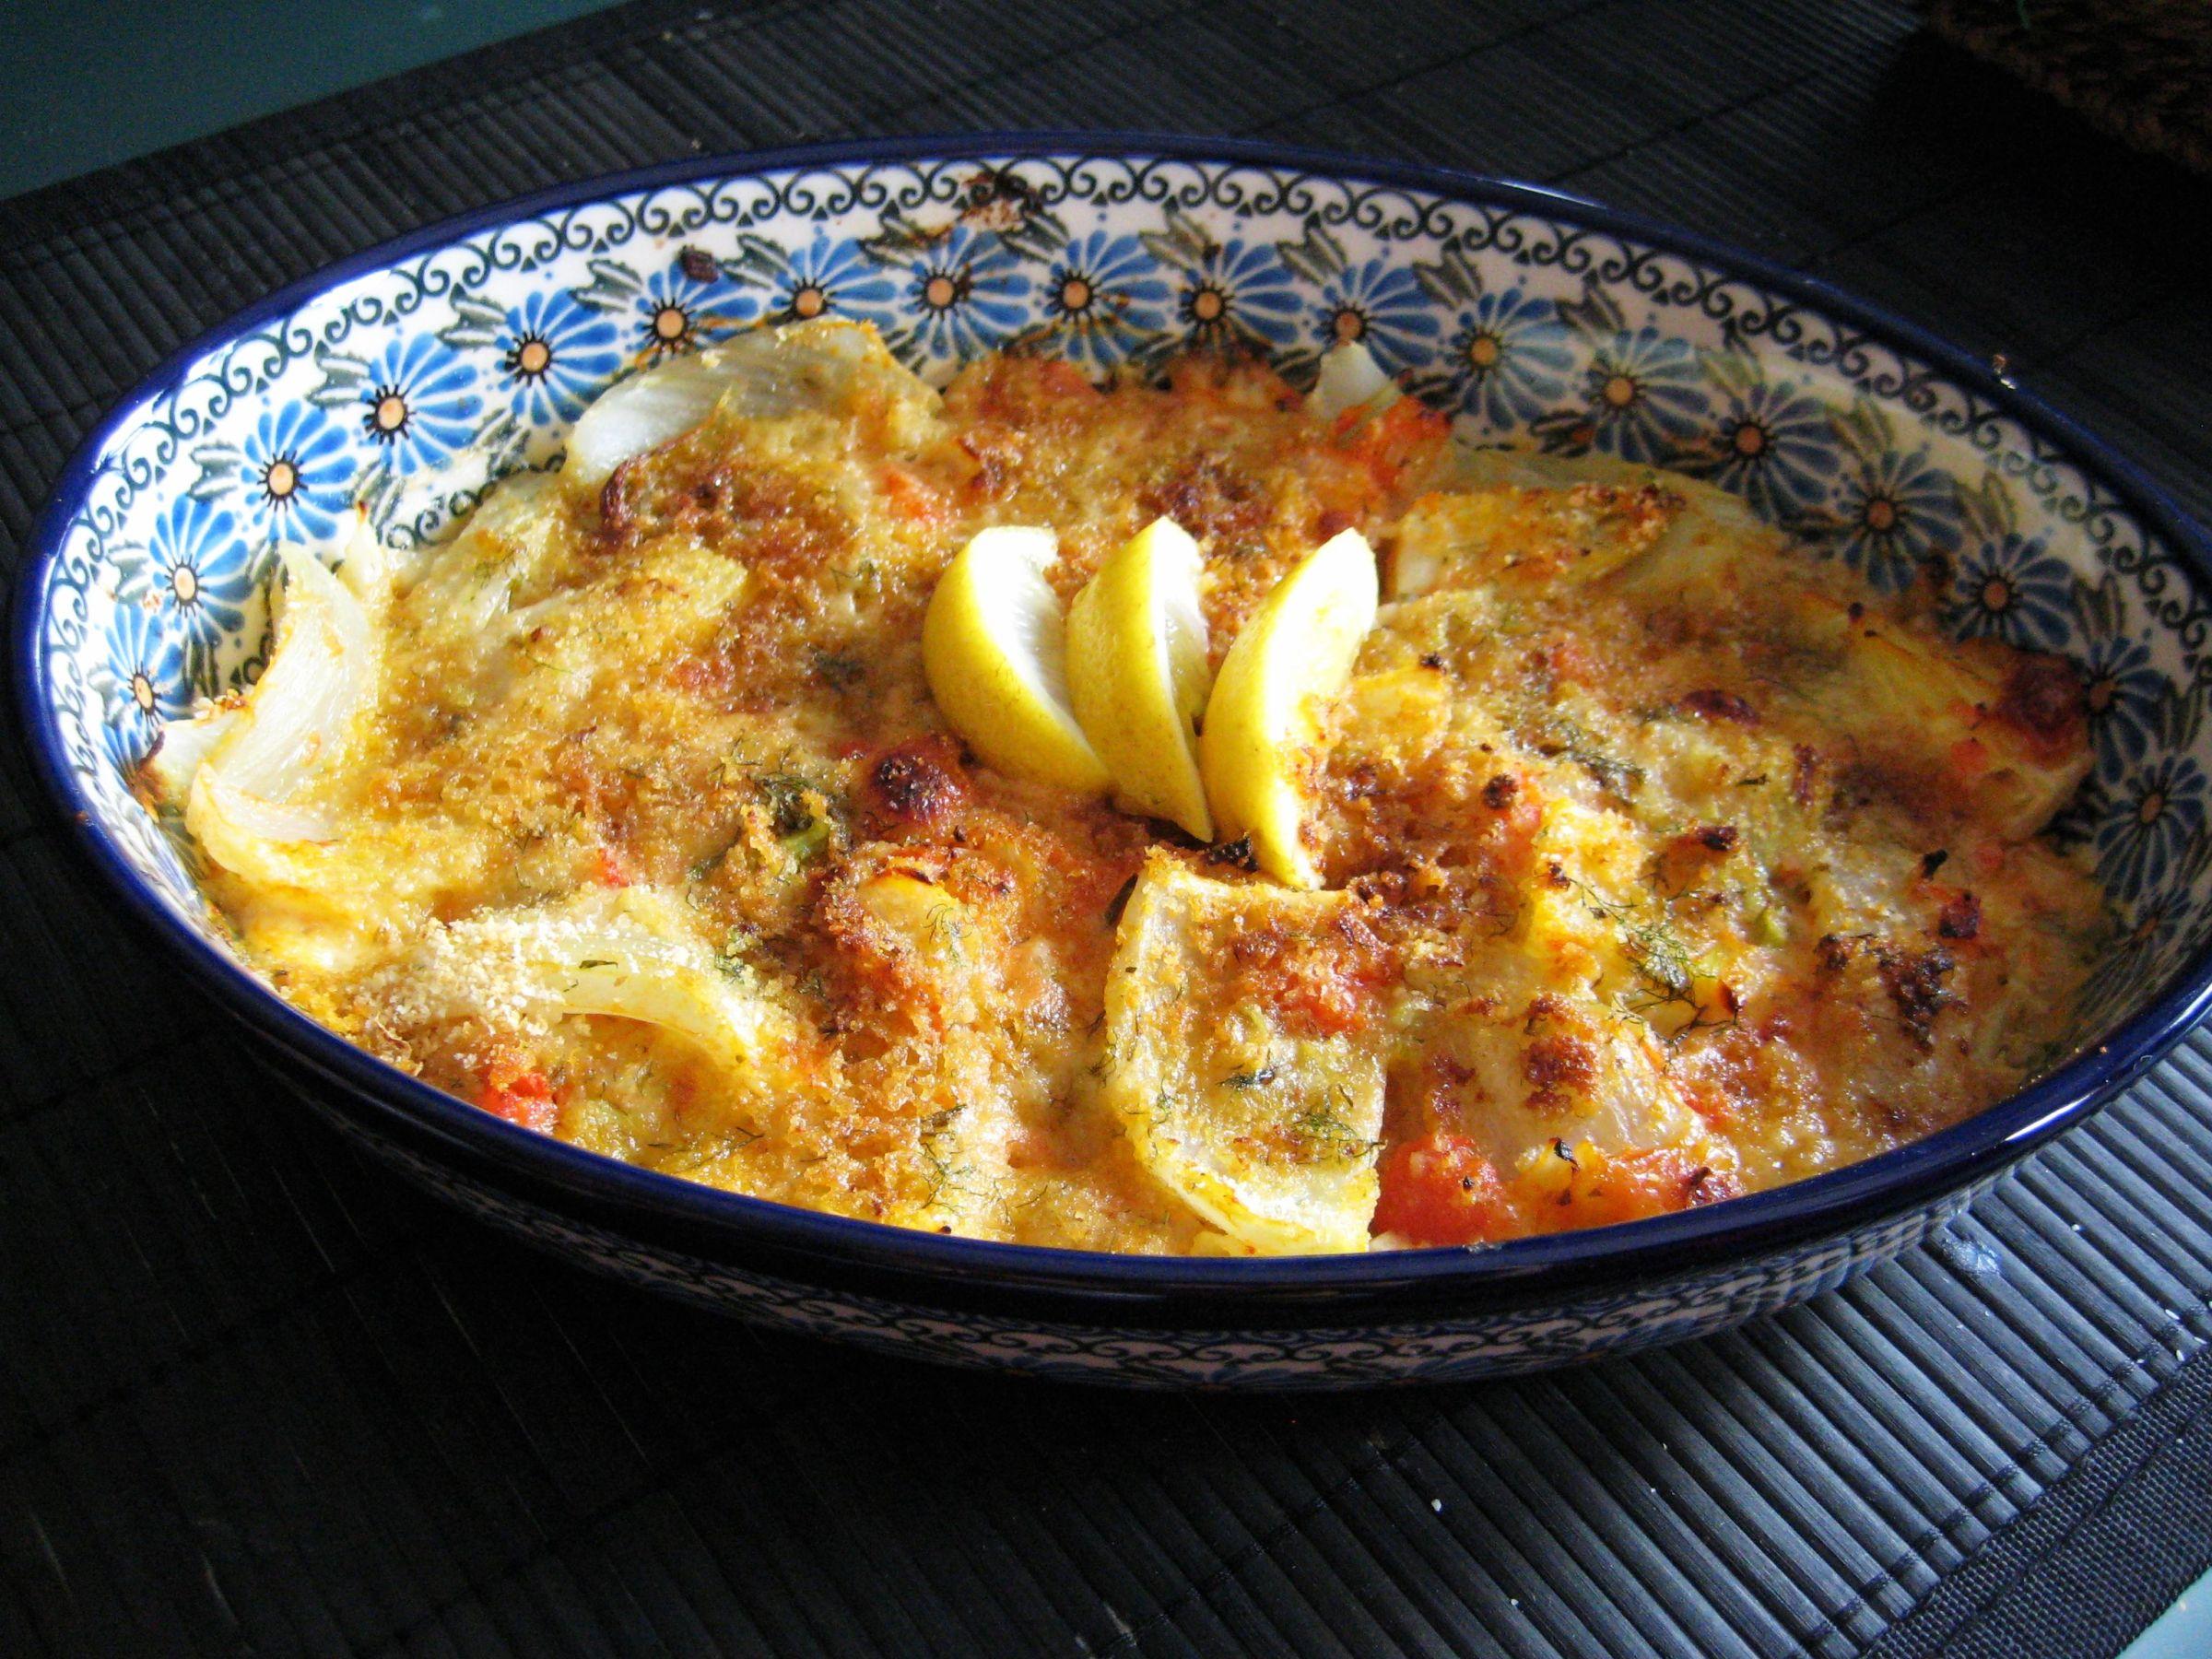 Fenchelgratin mit Tomaten und Mozzarella